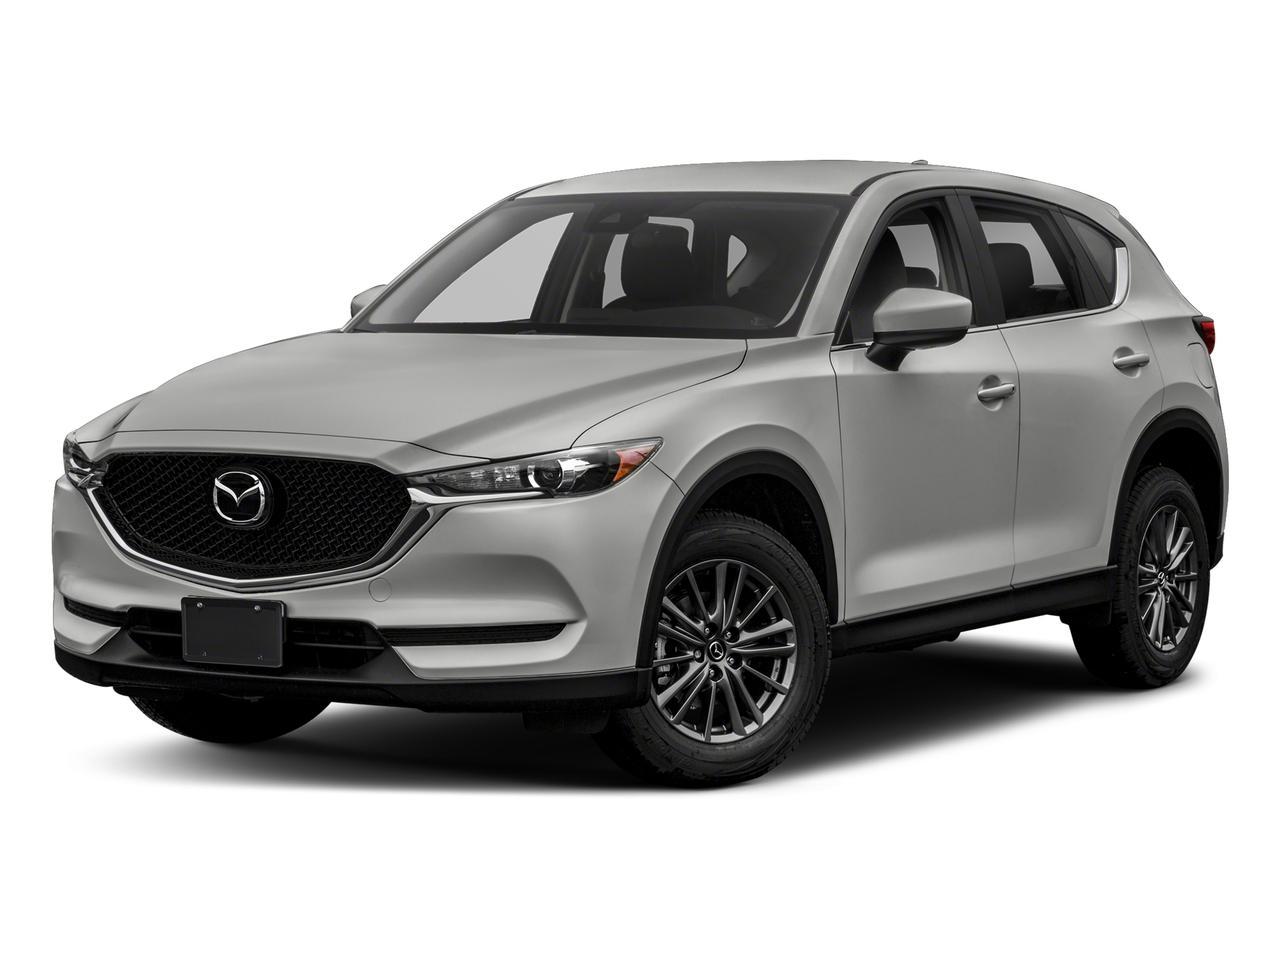 2018 Mazda CX-5 Vehicle Photo in Mission, TX 78572